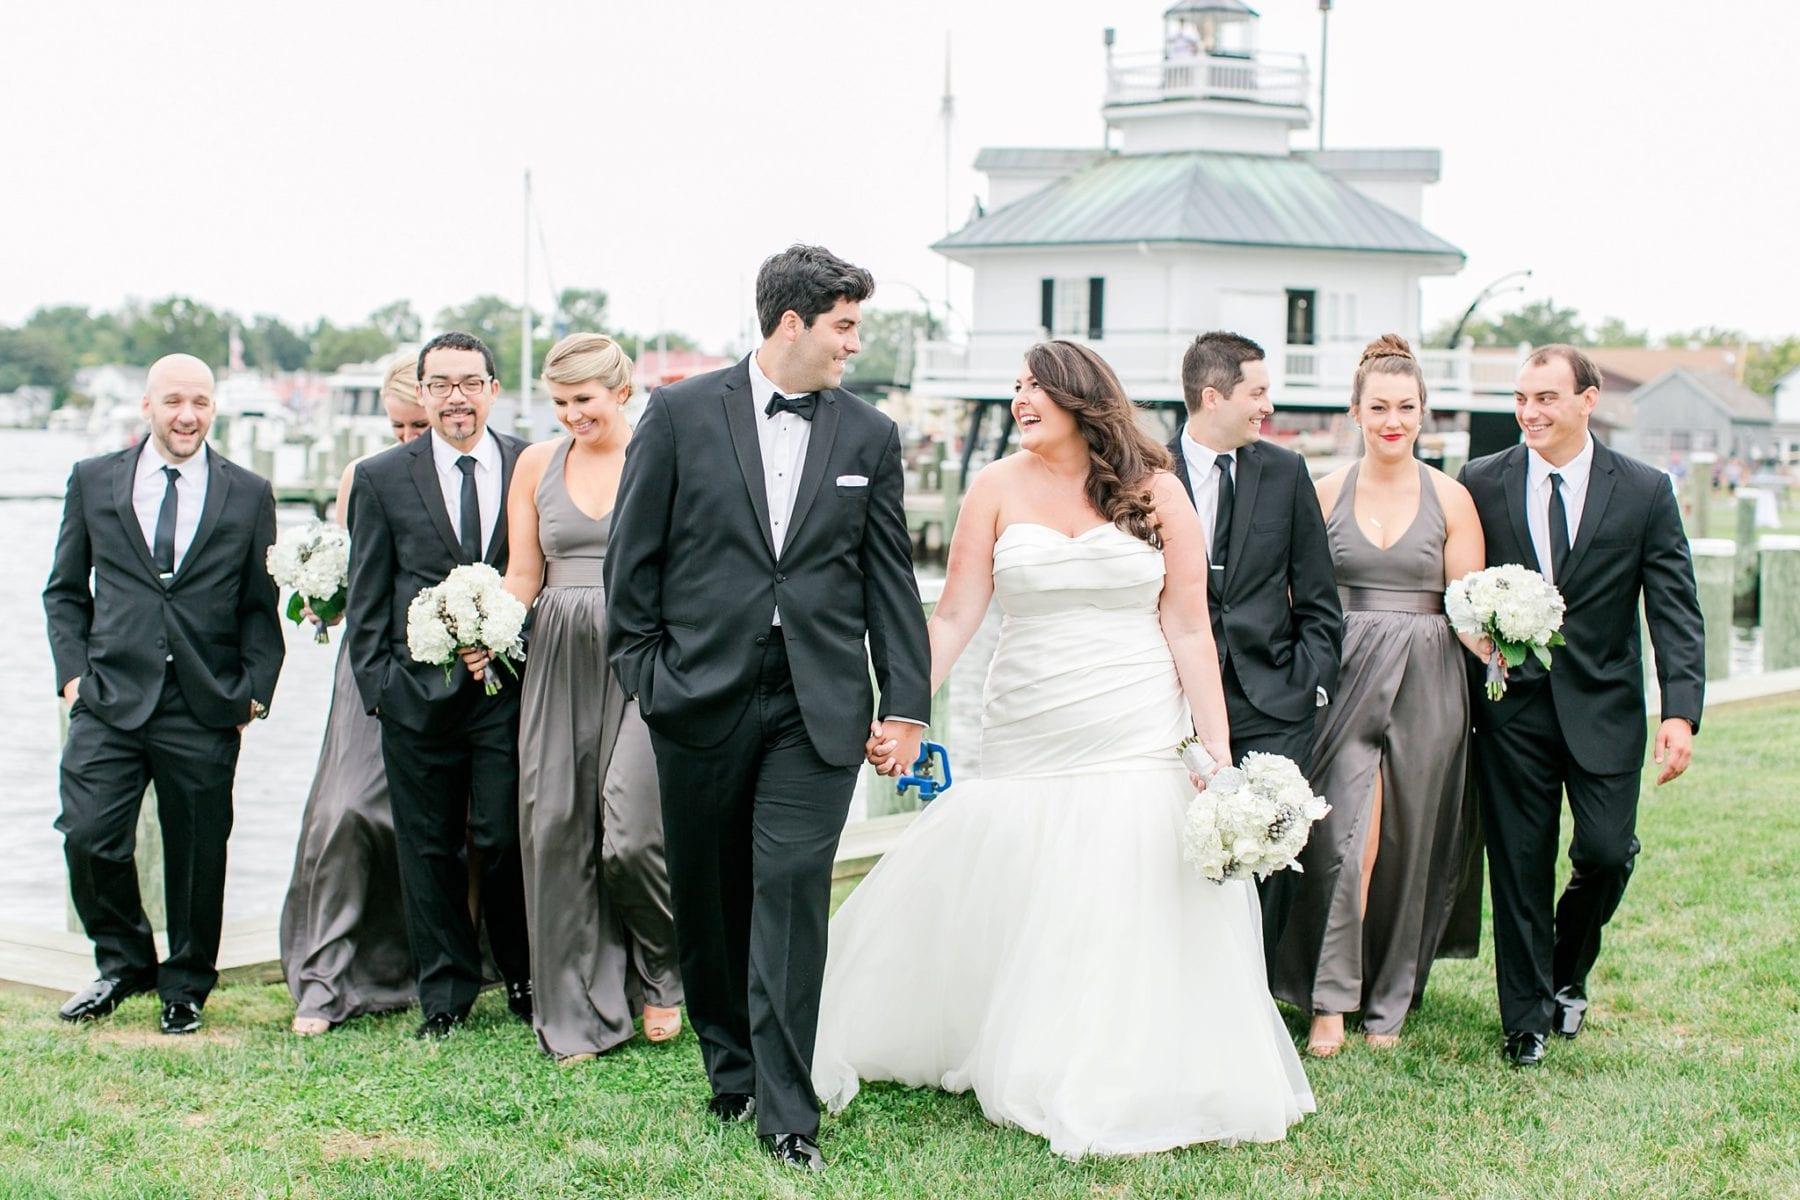 Chesapeake Bay Maritime Museum Wedding Photos Maryland Wedding Photographer Megan Kelsey Photography Halie & Mike-75.jpg